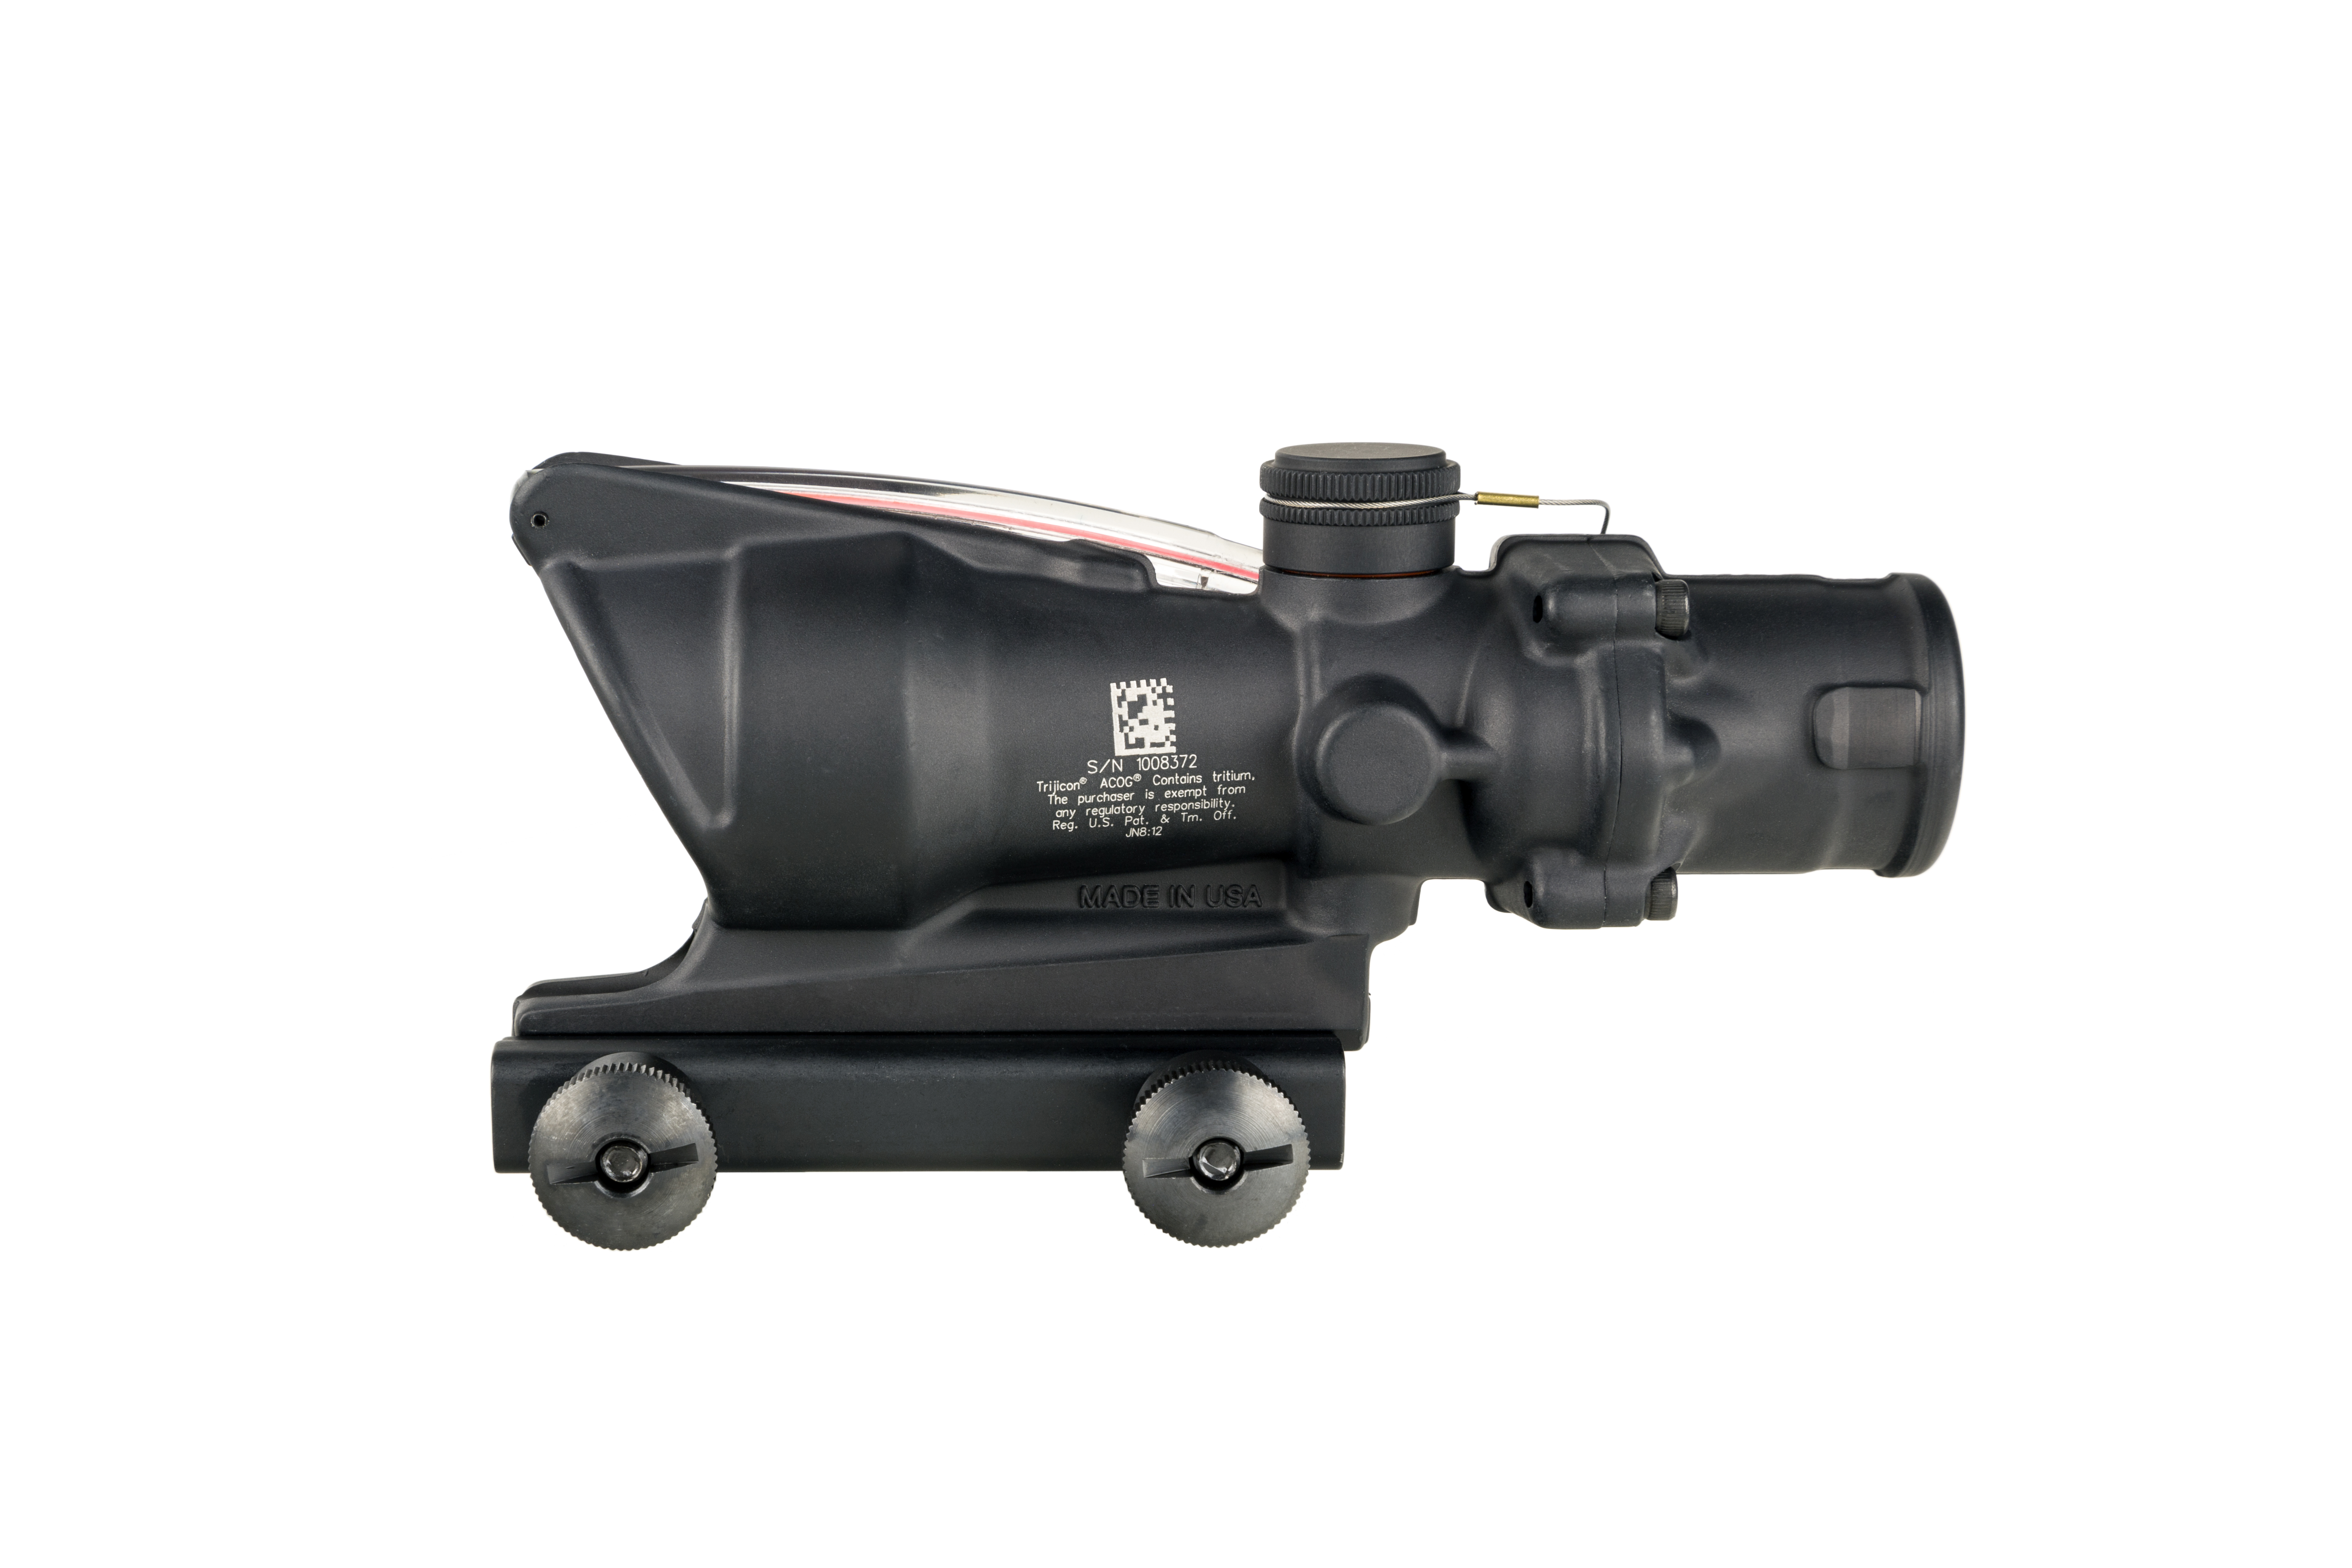 TA31-D-100581 angle 2